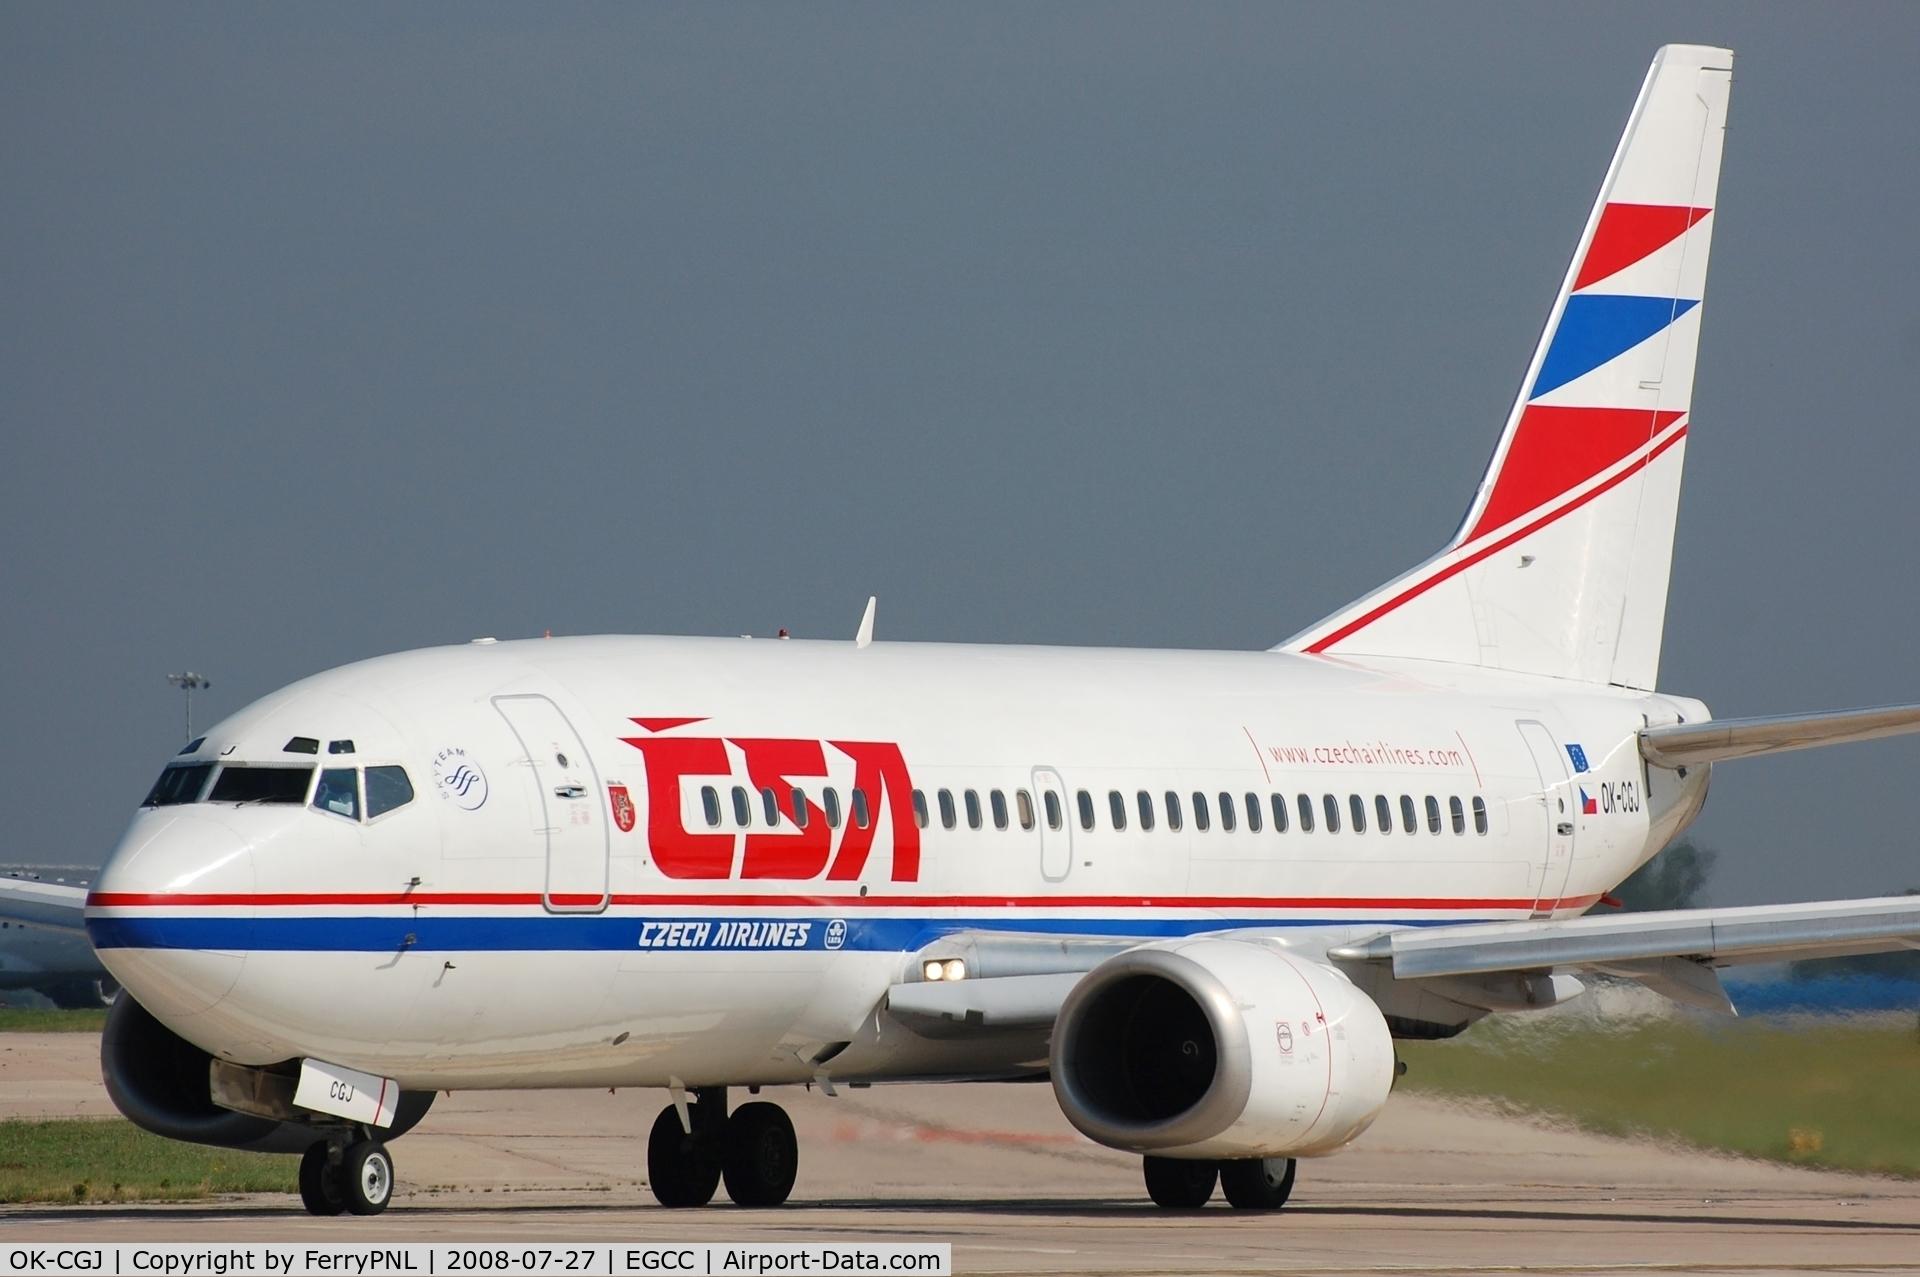 OK-CGJ, 1997 Boeing 737-500 C/N 28470, CSA B735 lining-up.